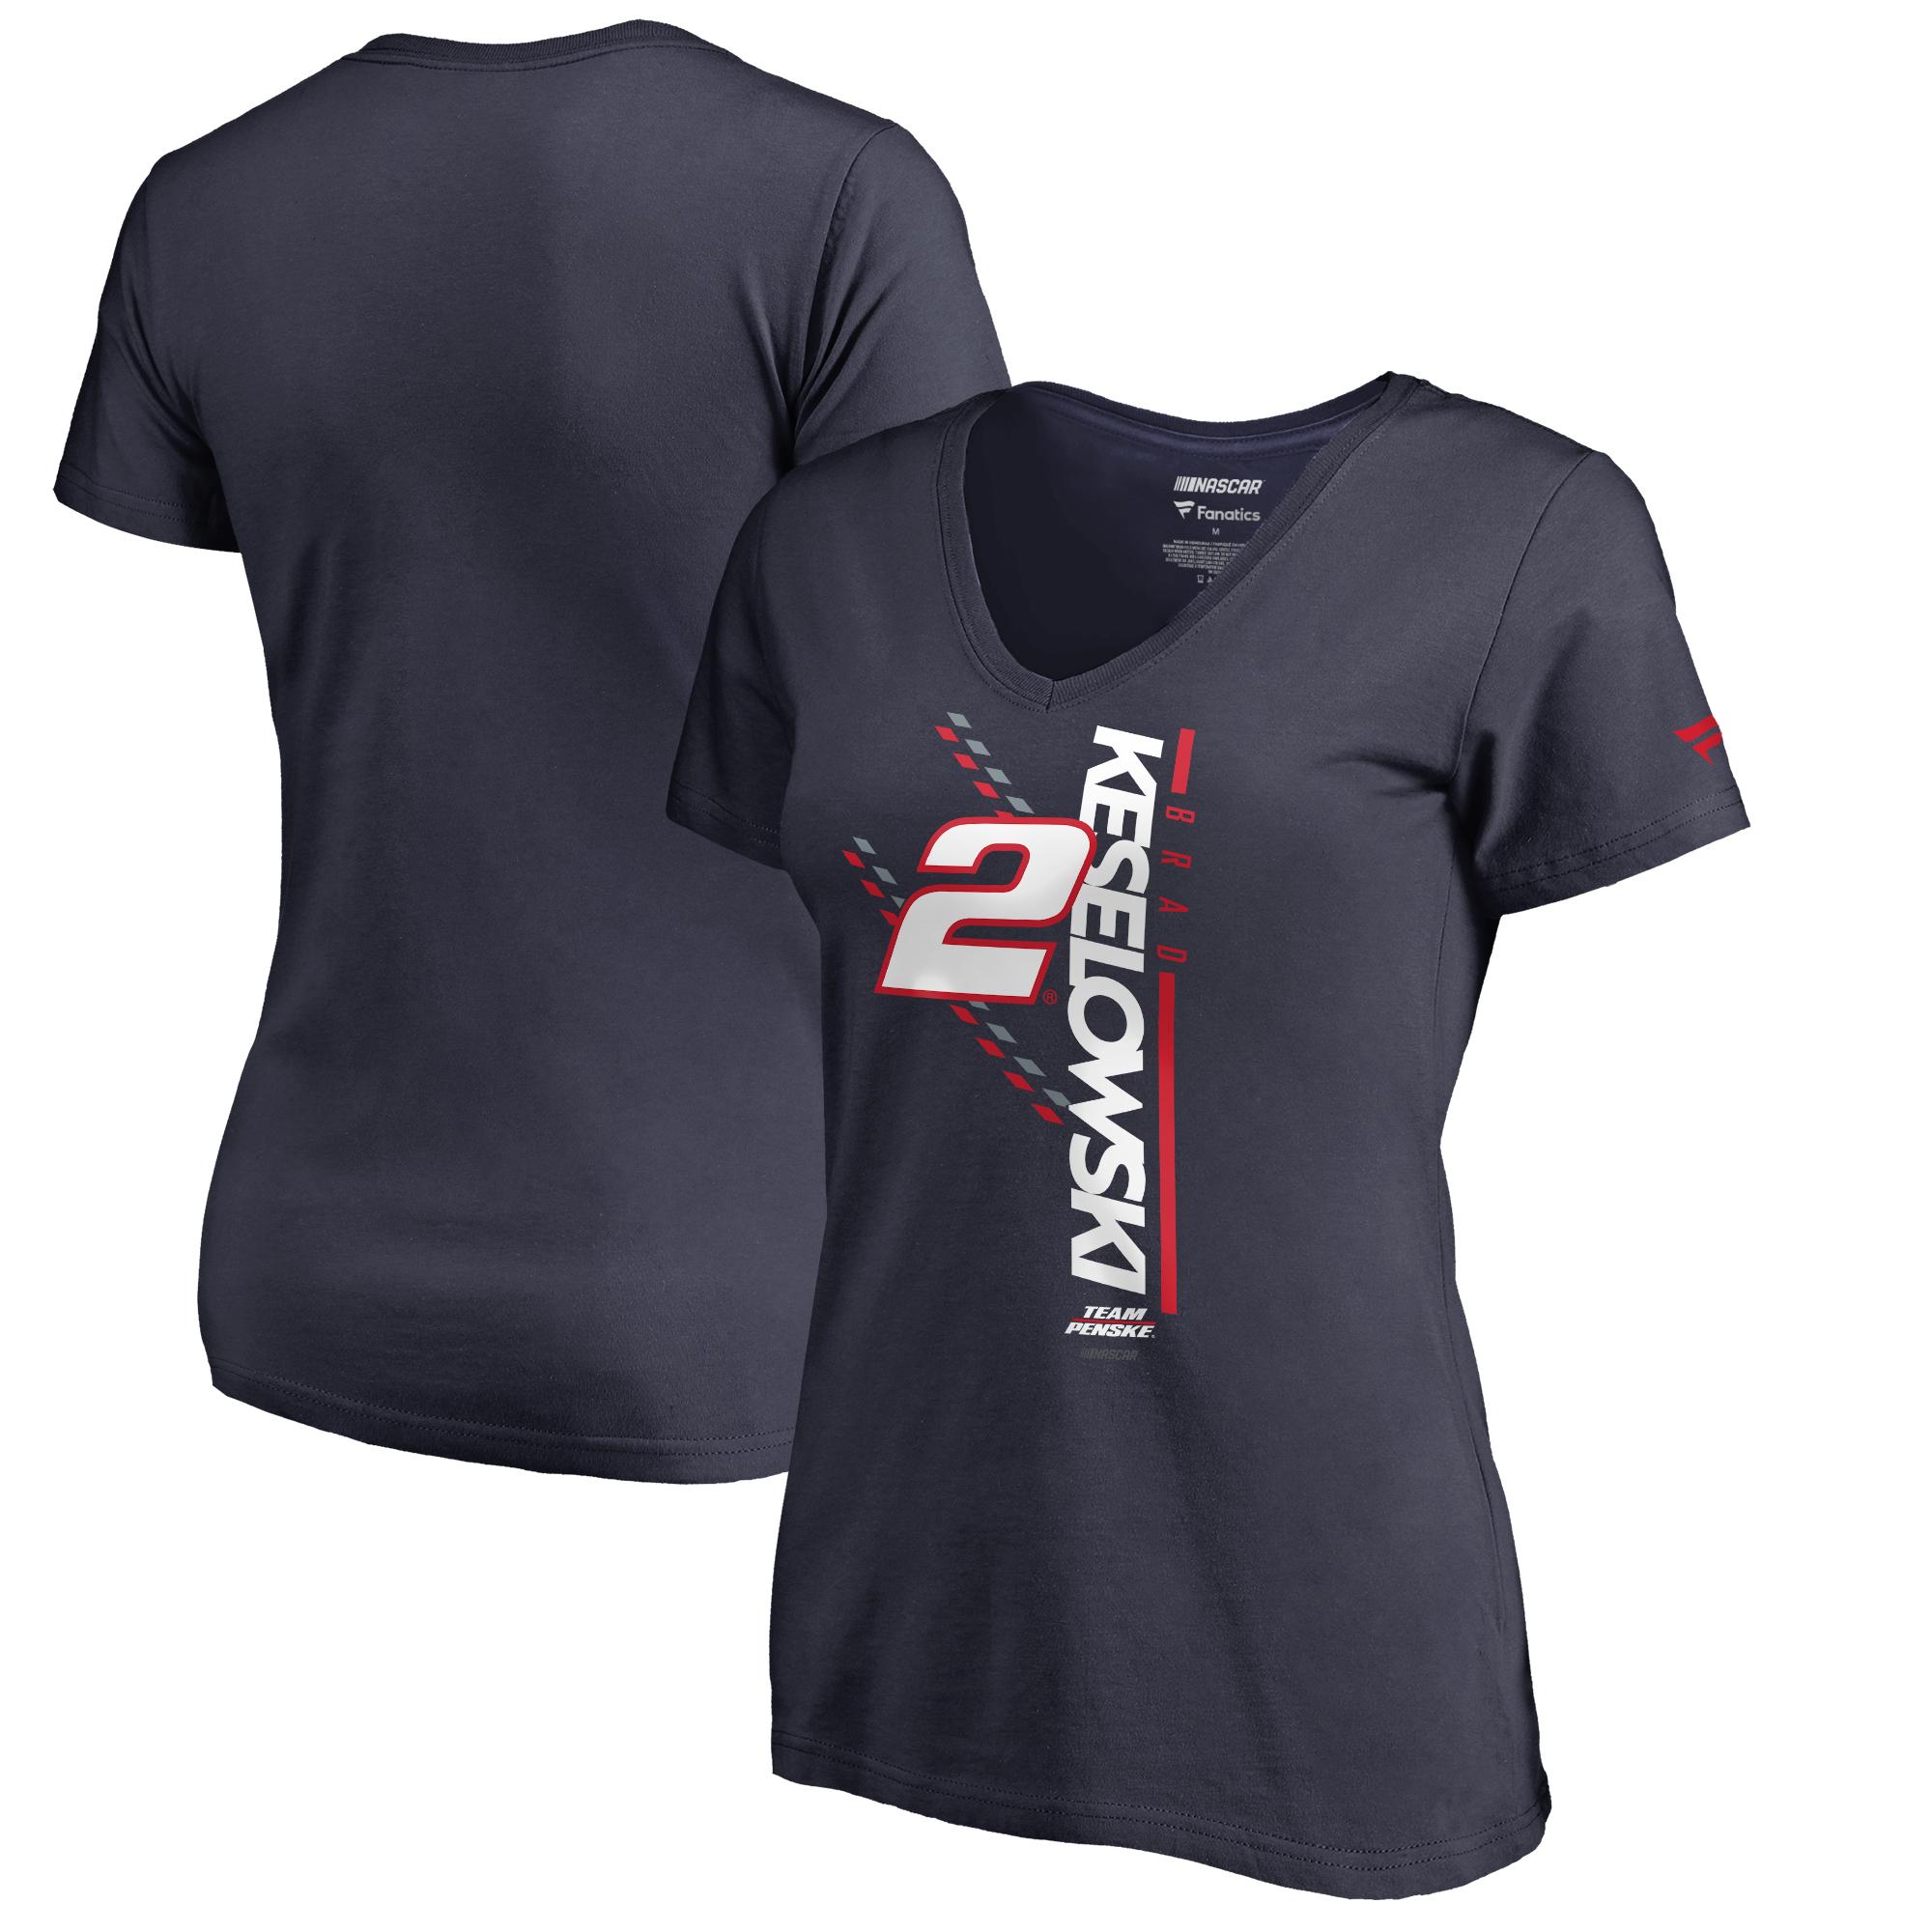 Brad Keselowski Fanatics Branded Women's NASCAR Track Bar V-Neck T-Shirt - Navy